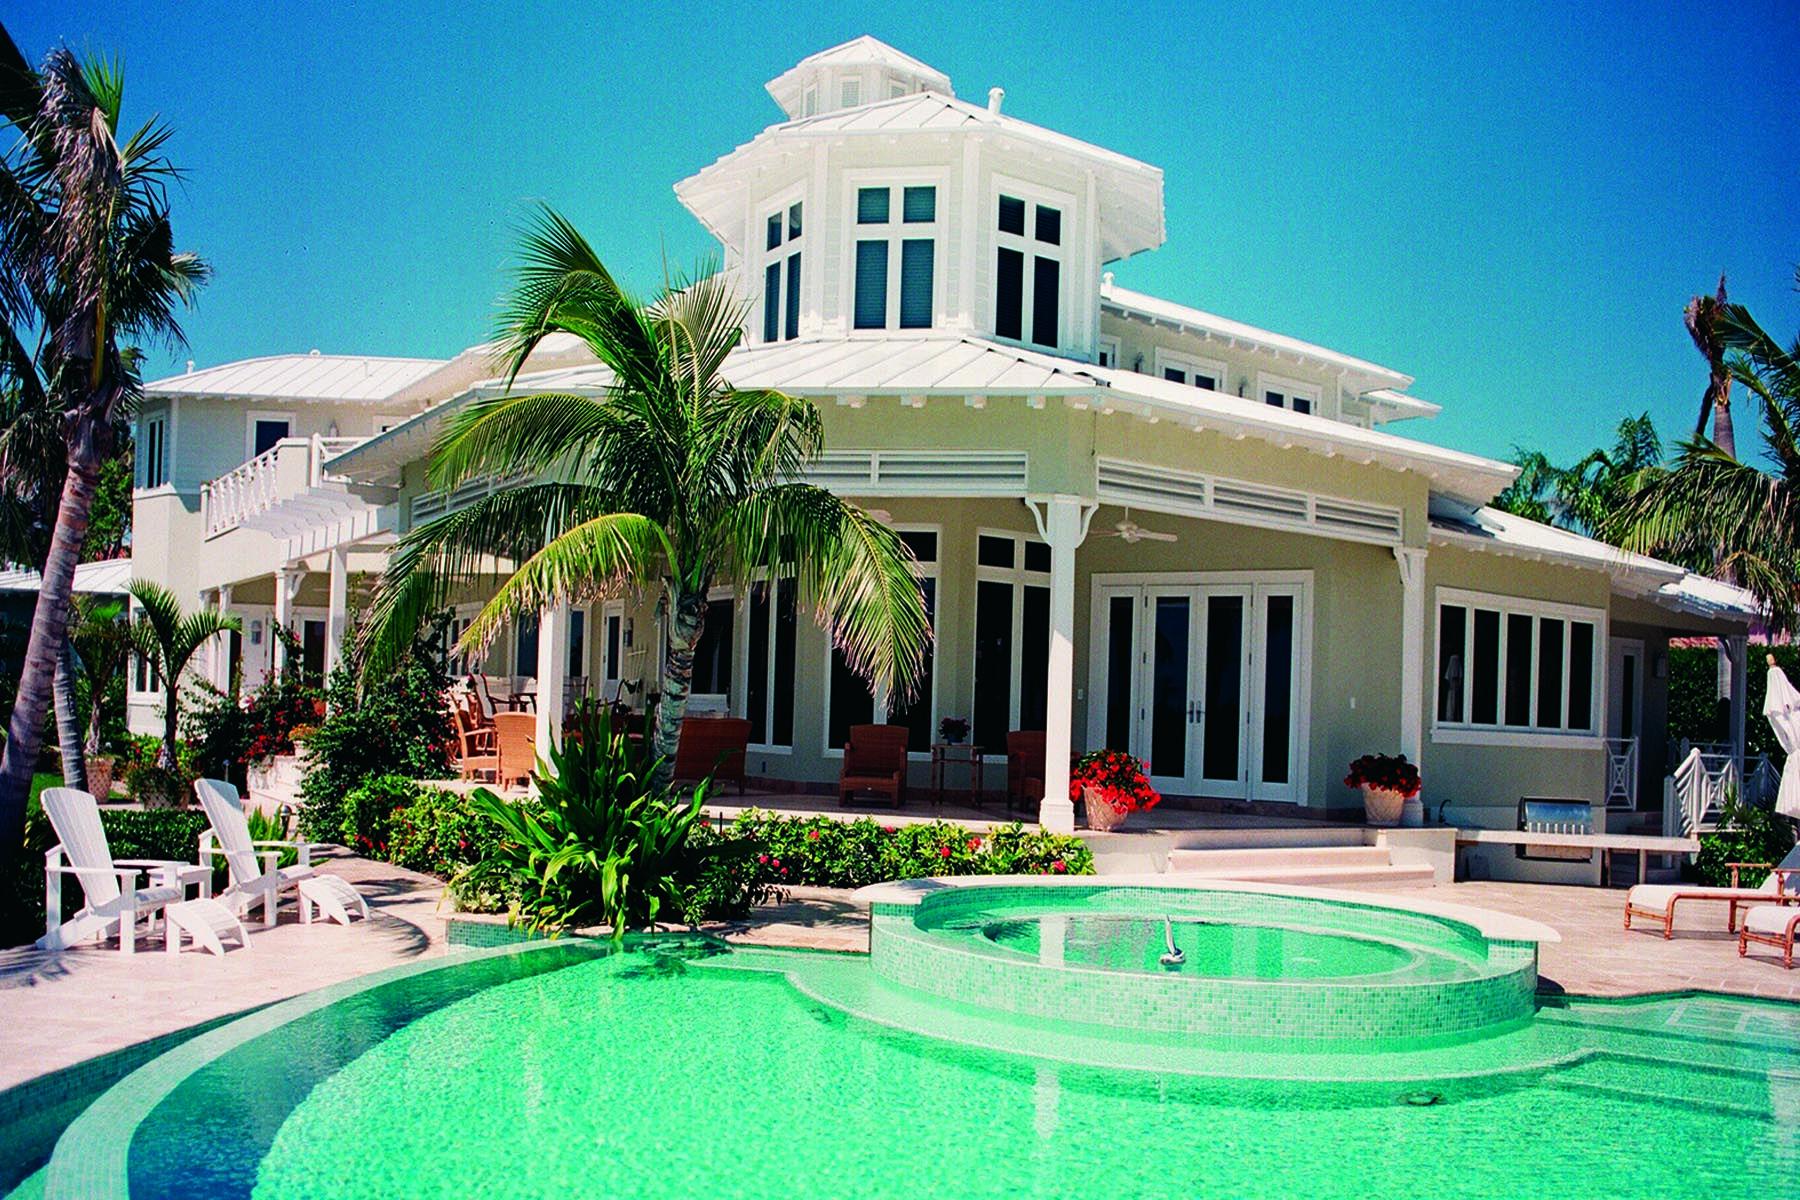 Drexel Metals Regal White Metal Roof Florida Keys